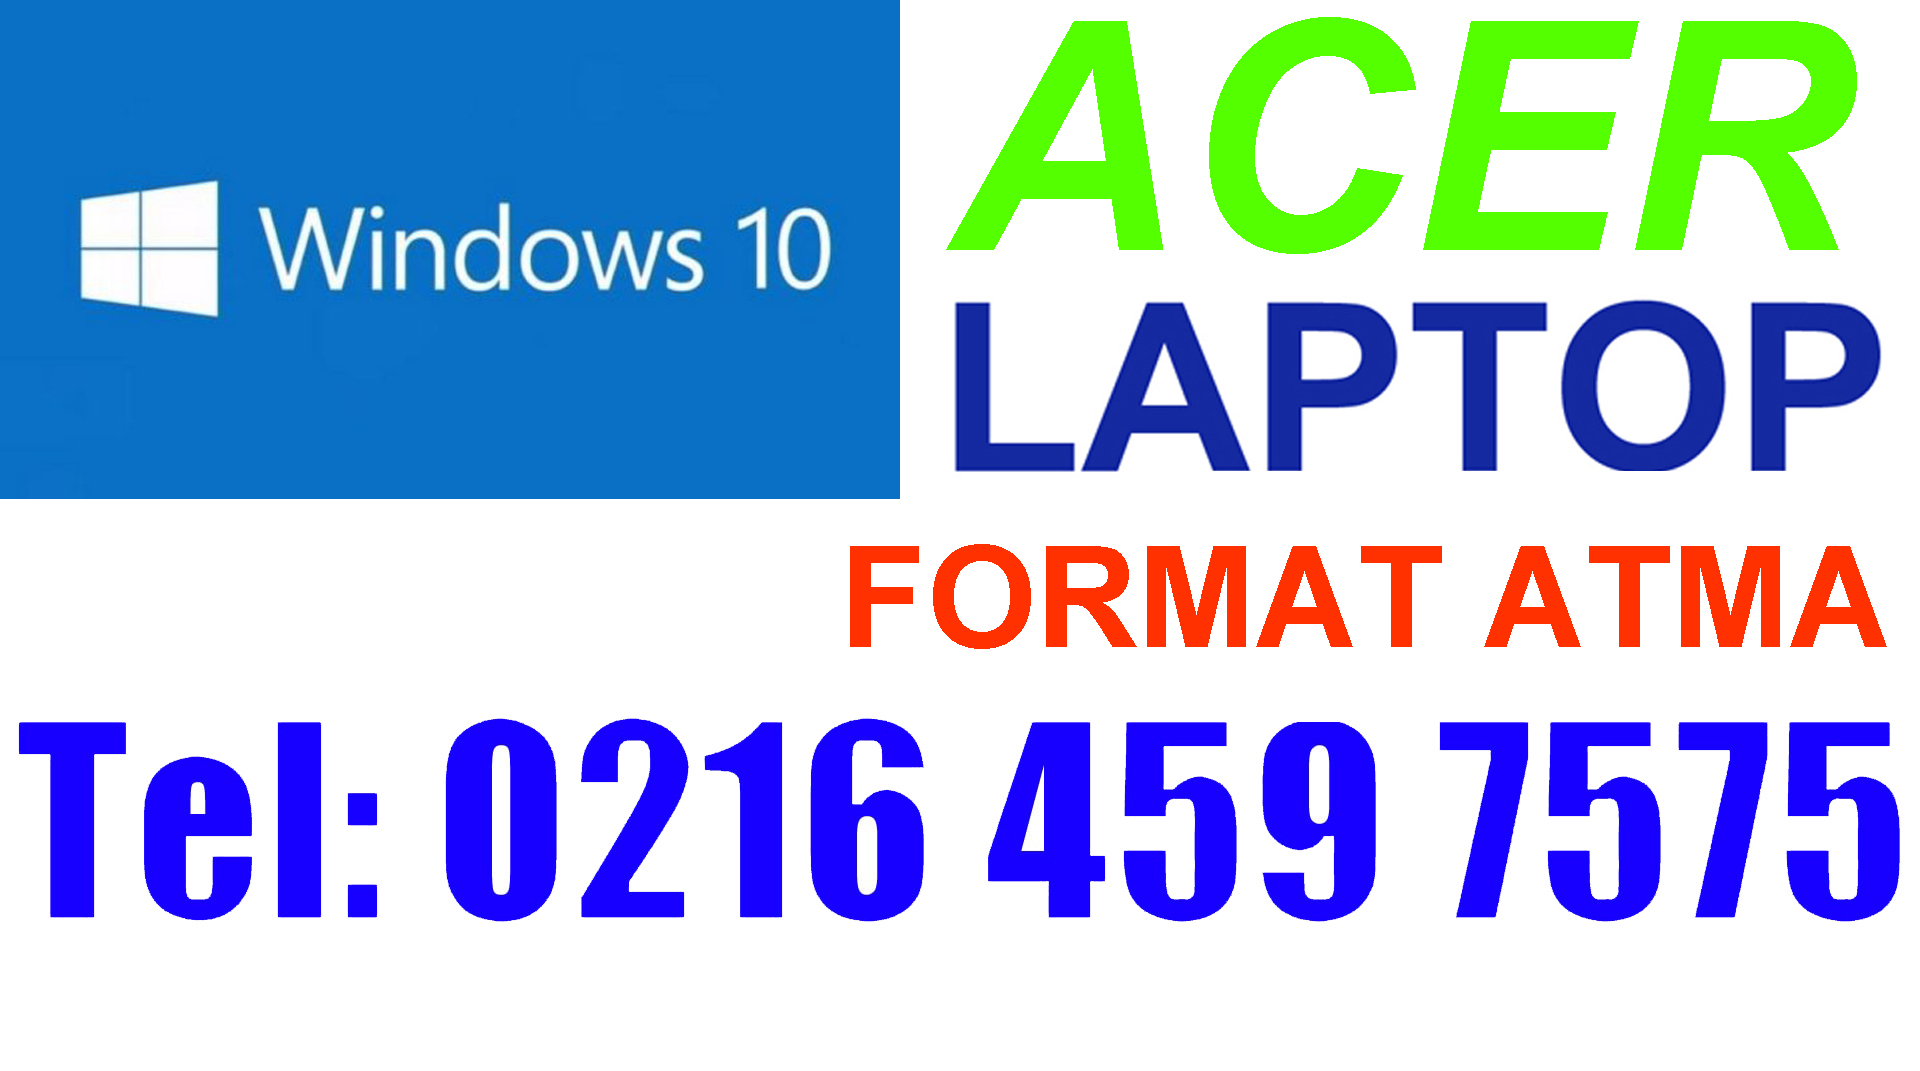 Acer Laptop Format Atma